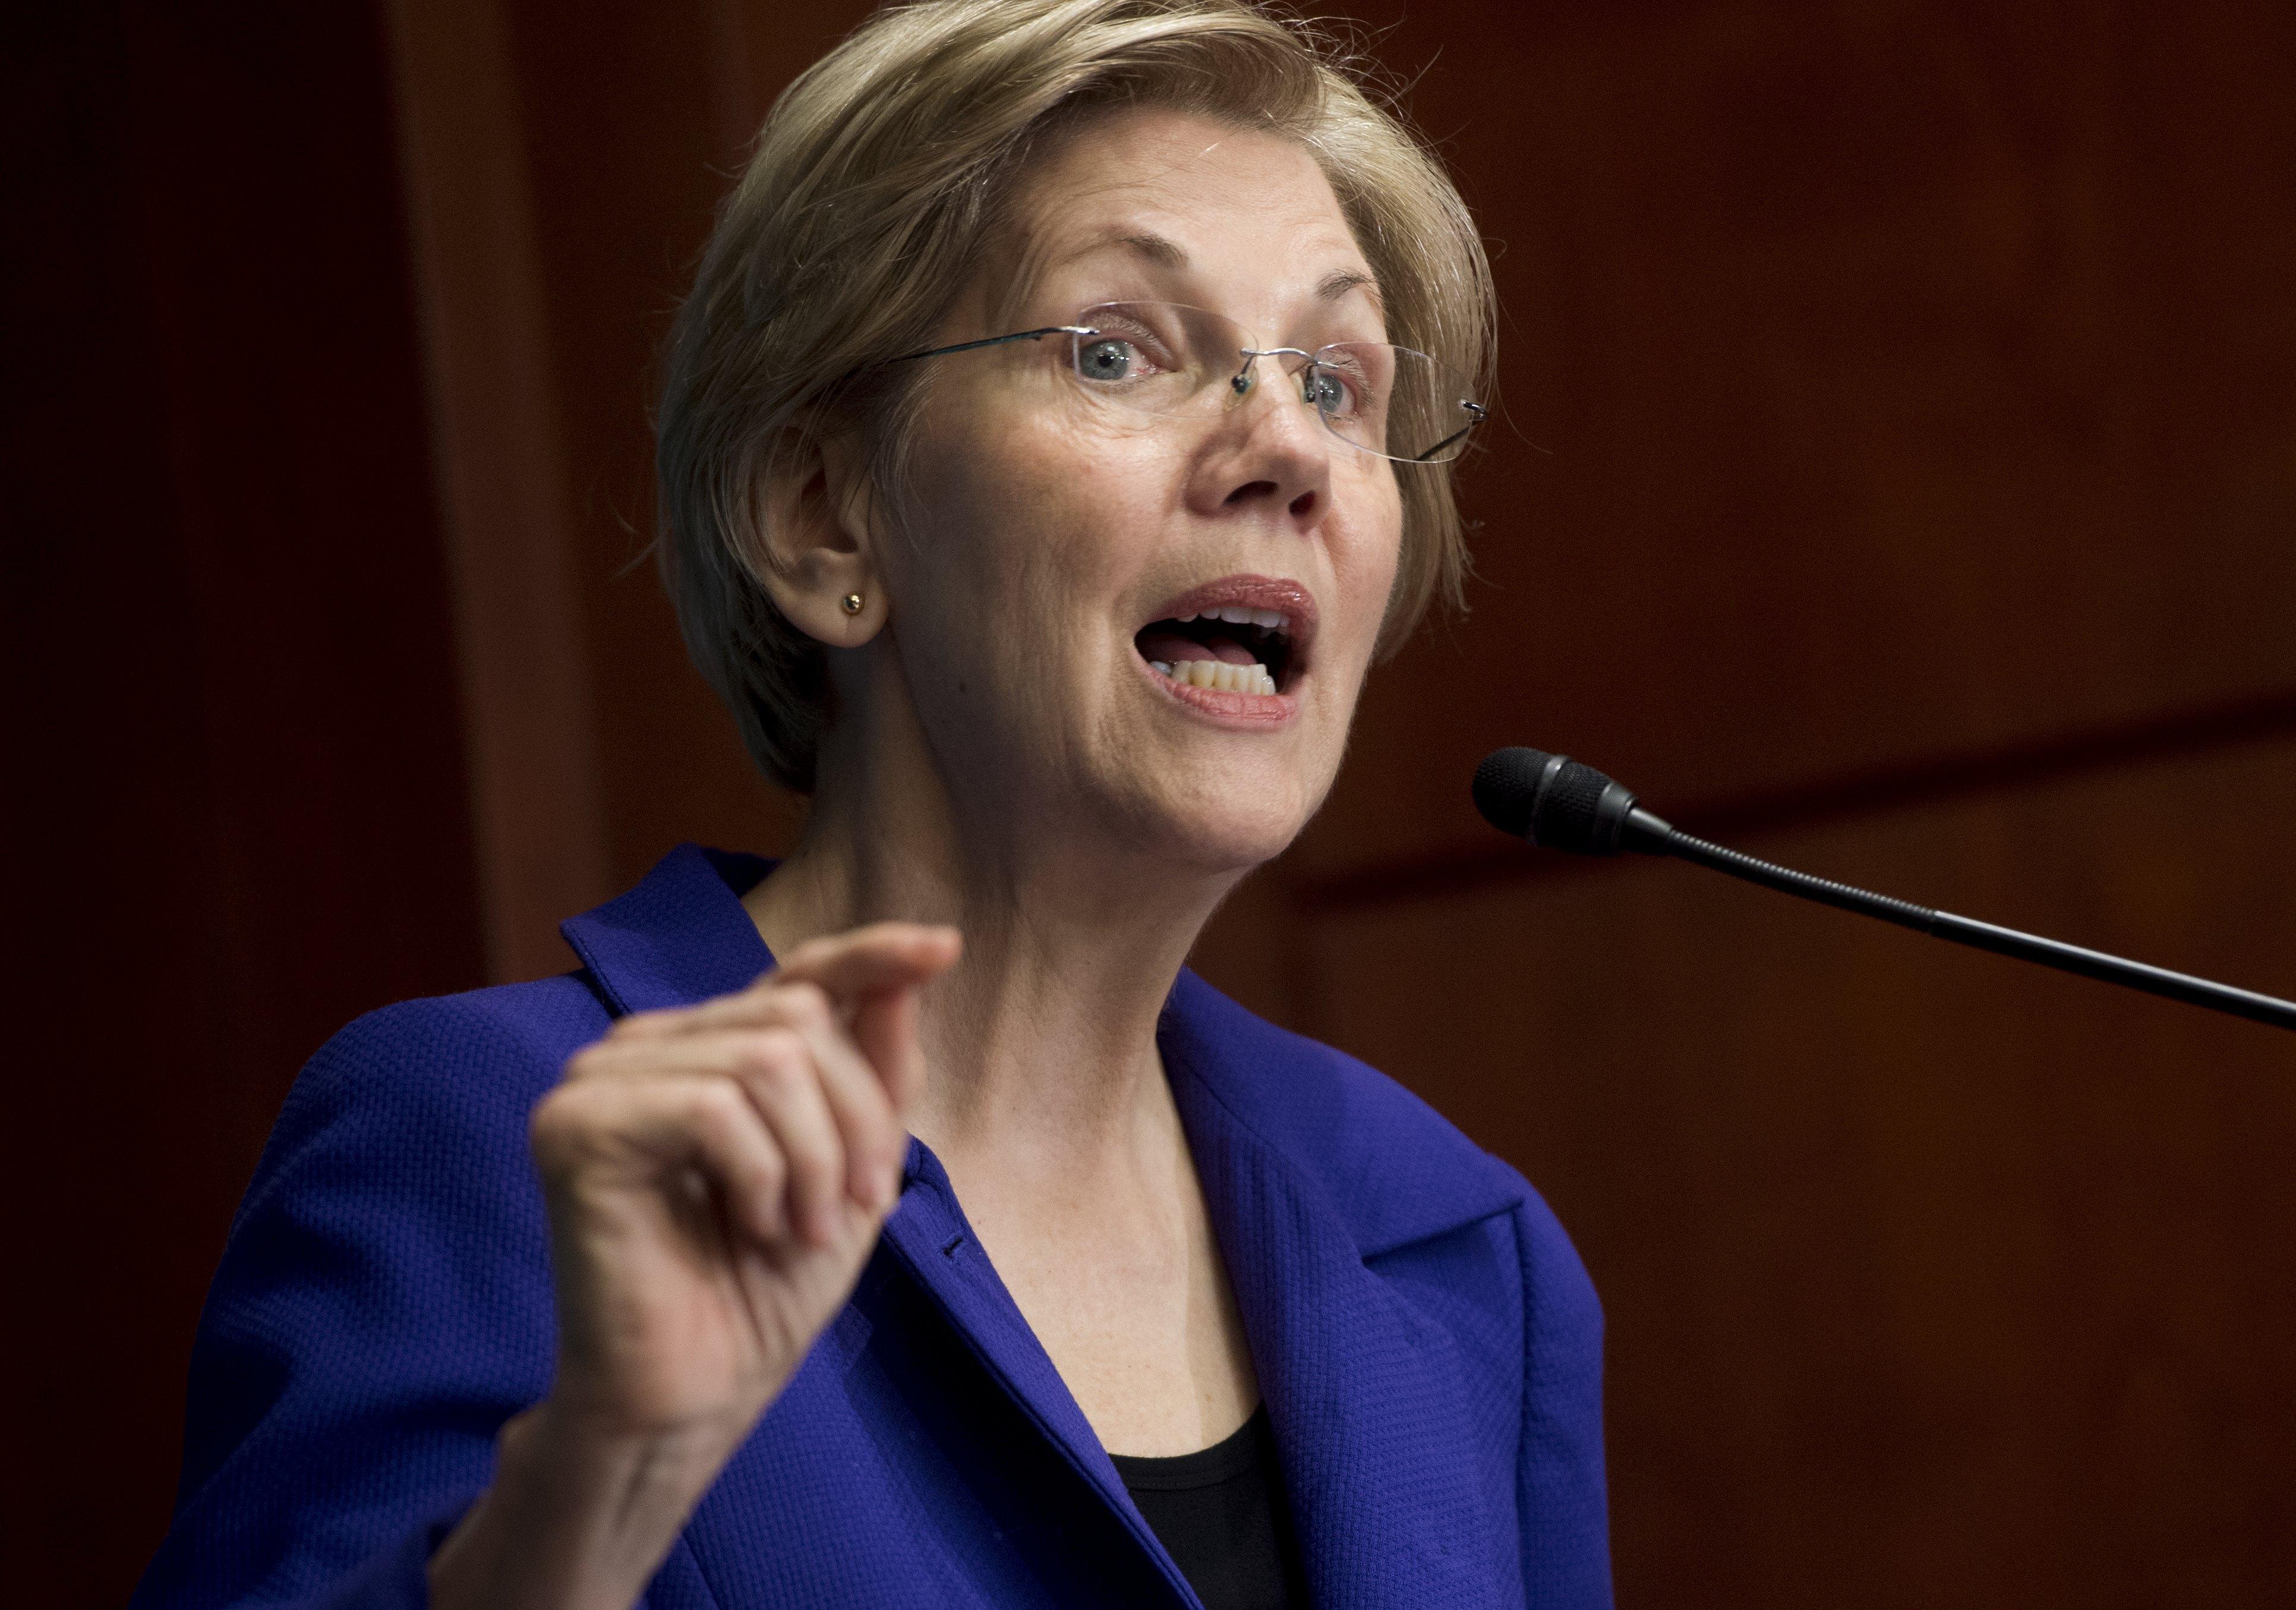 Senator Elizabeth Warren, Democrat of Massachusetts, speaks about open markets and monopolies in the US economy during the New America's Open Market Program on Capitol Hill in Washington, DC, June 29, 2016.